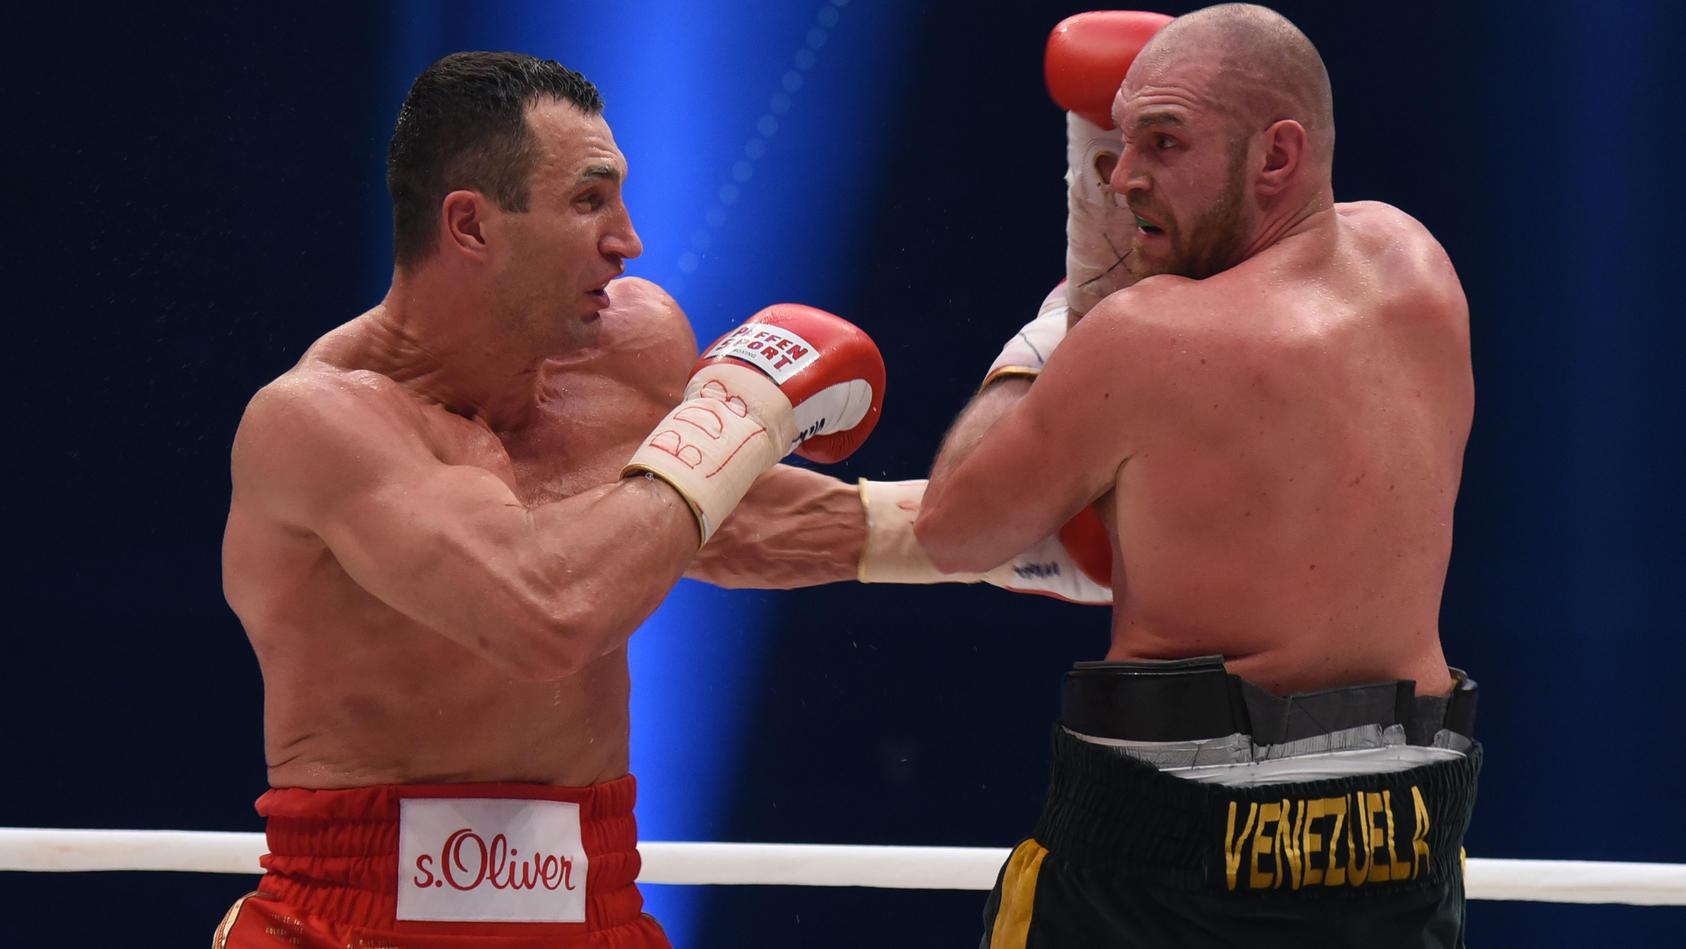 World Heavyweight Championship fight Wladimir Klitschko vs. Tuyson Fury - Fight